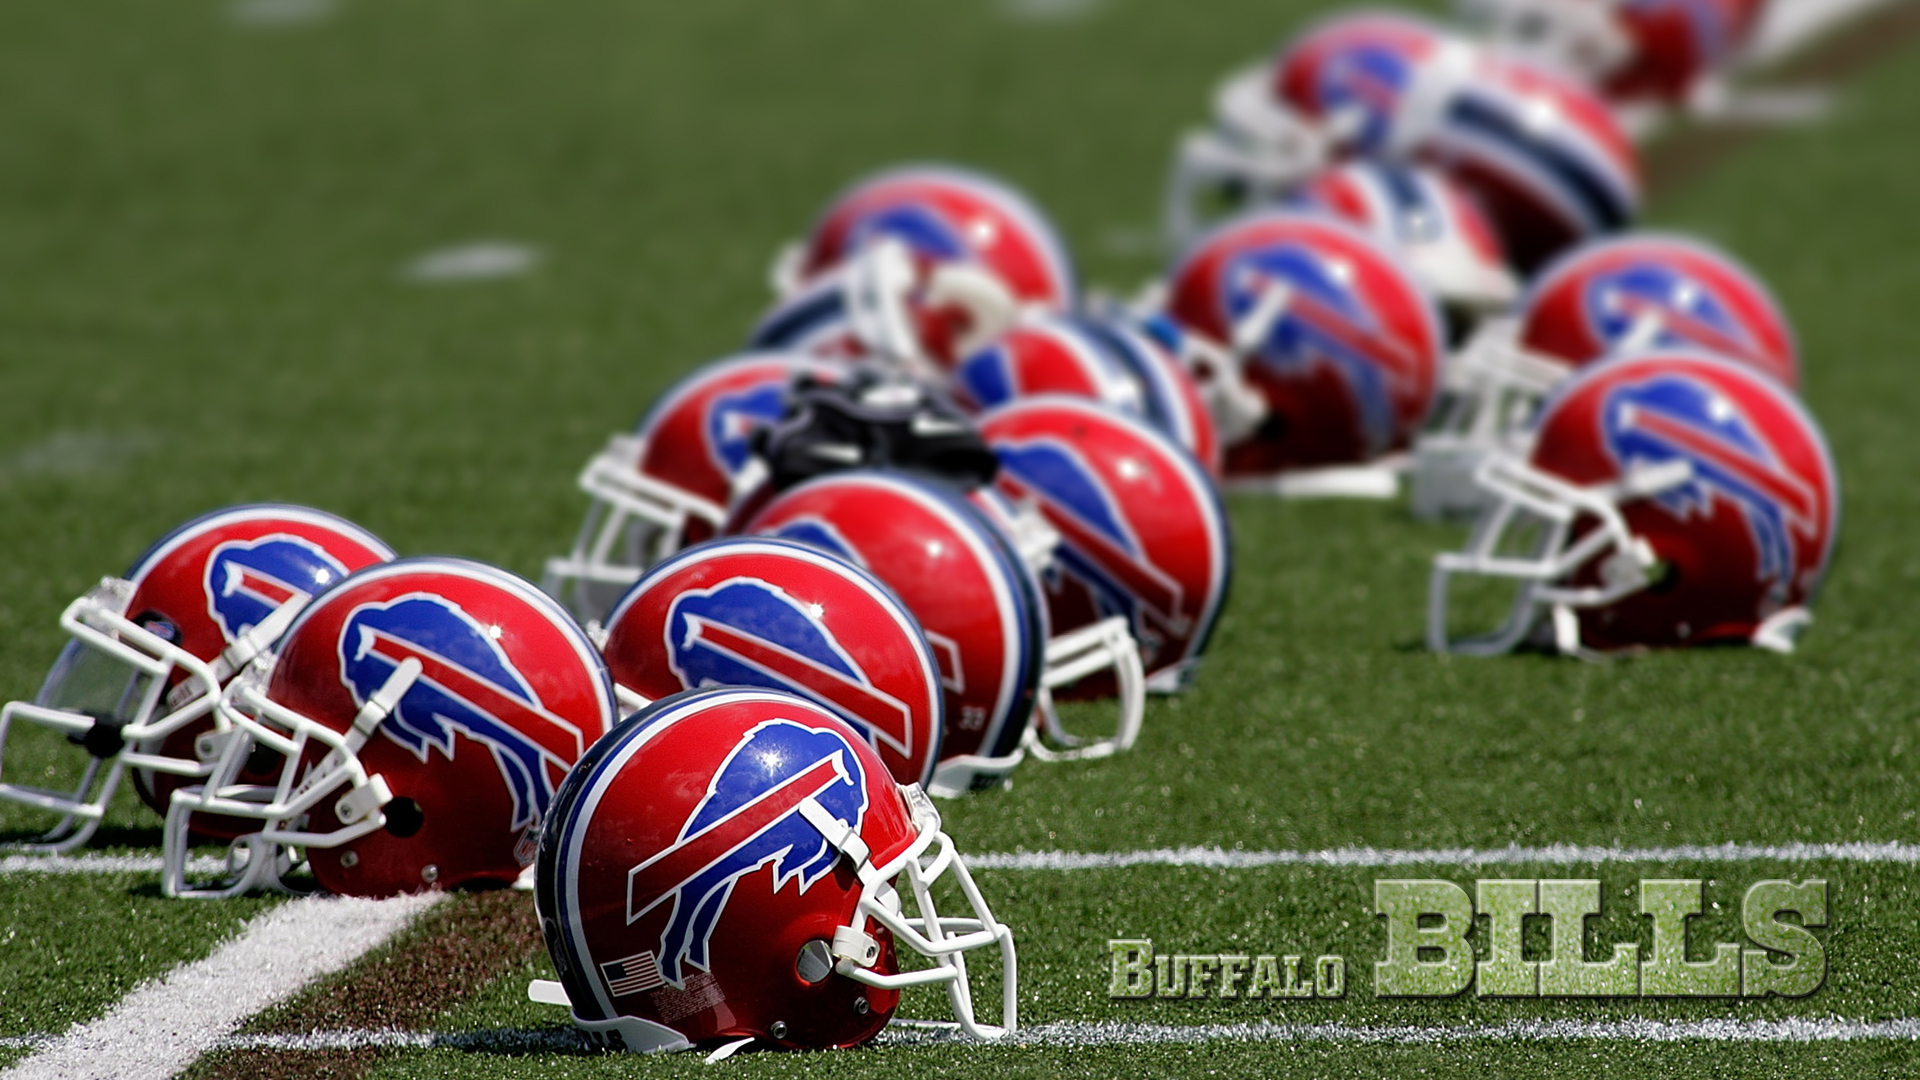 Buffalo Bills Wallpapers Hd